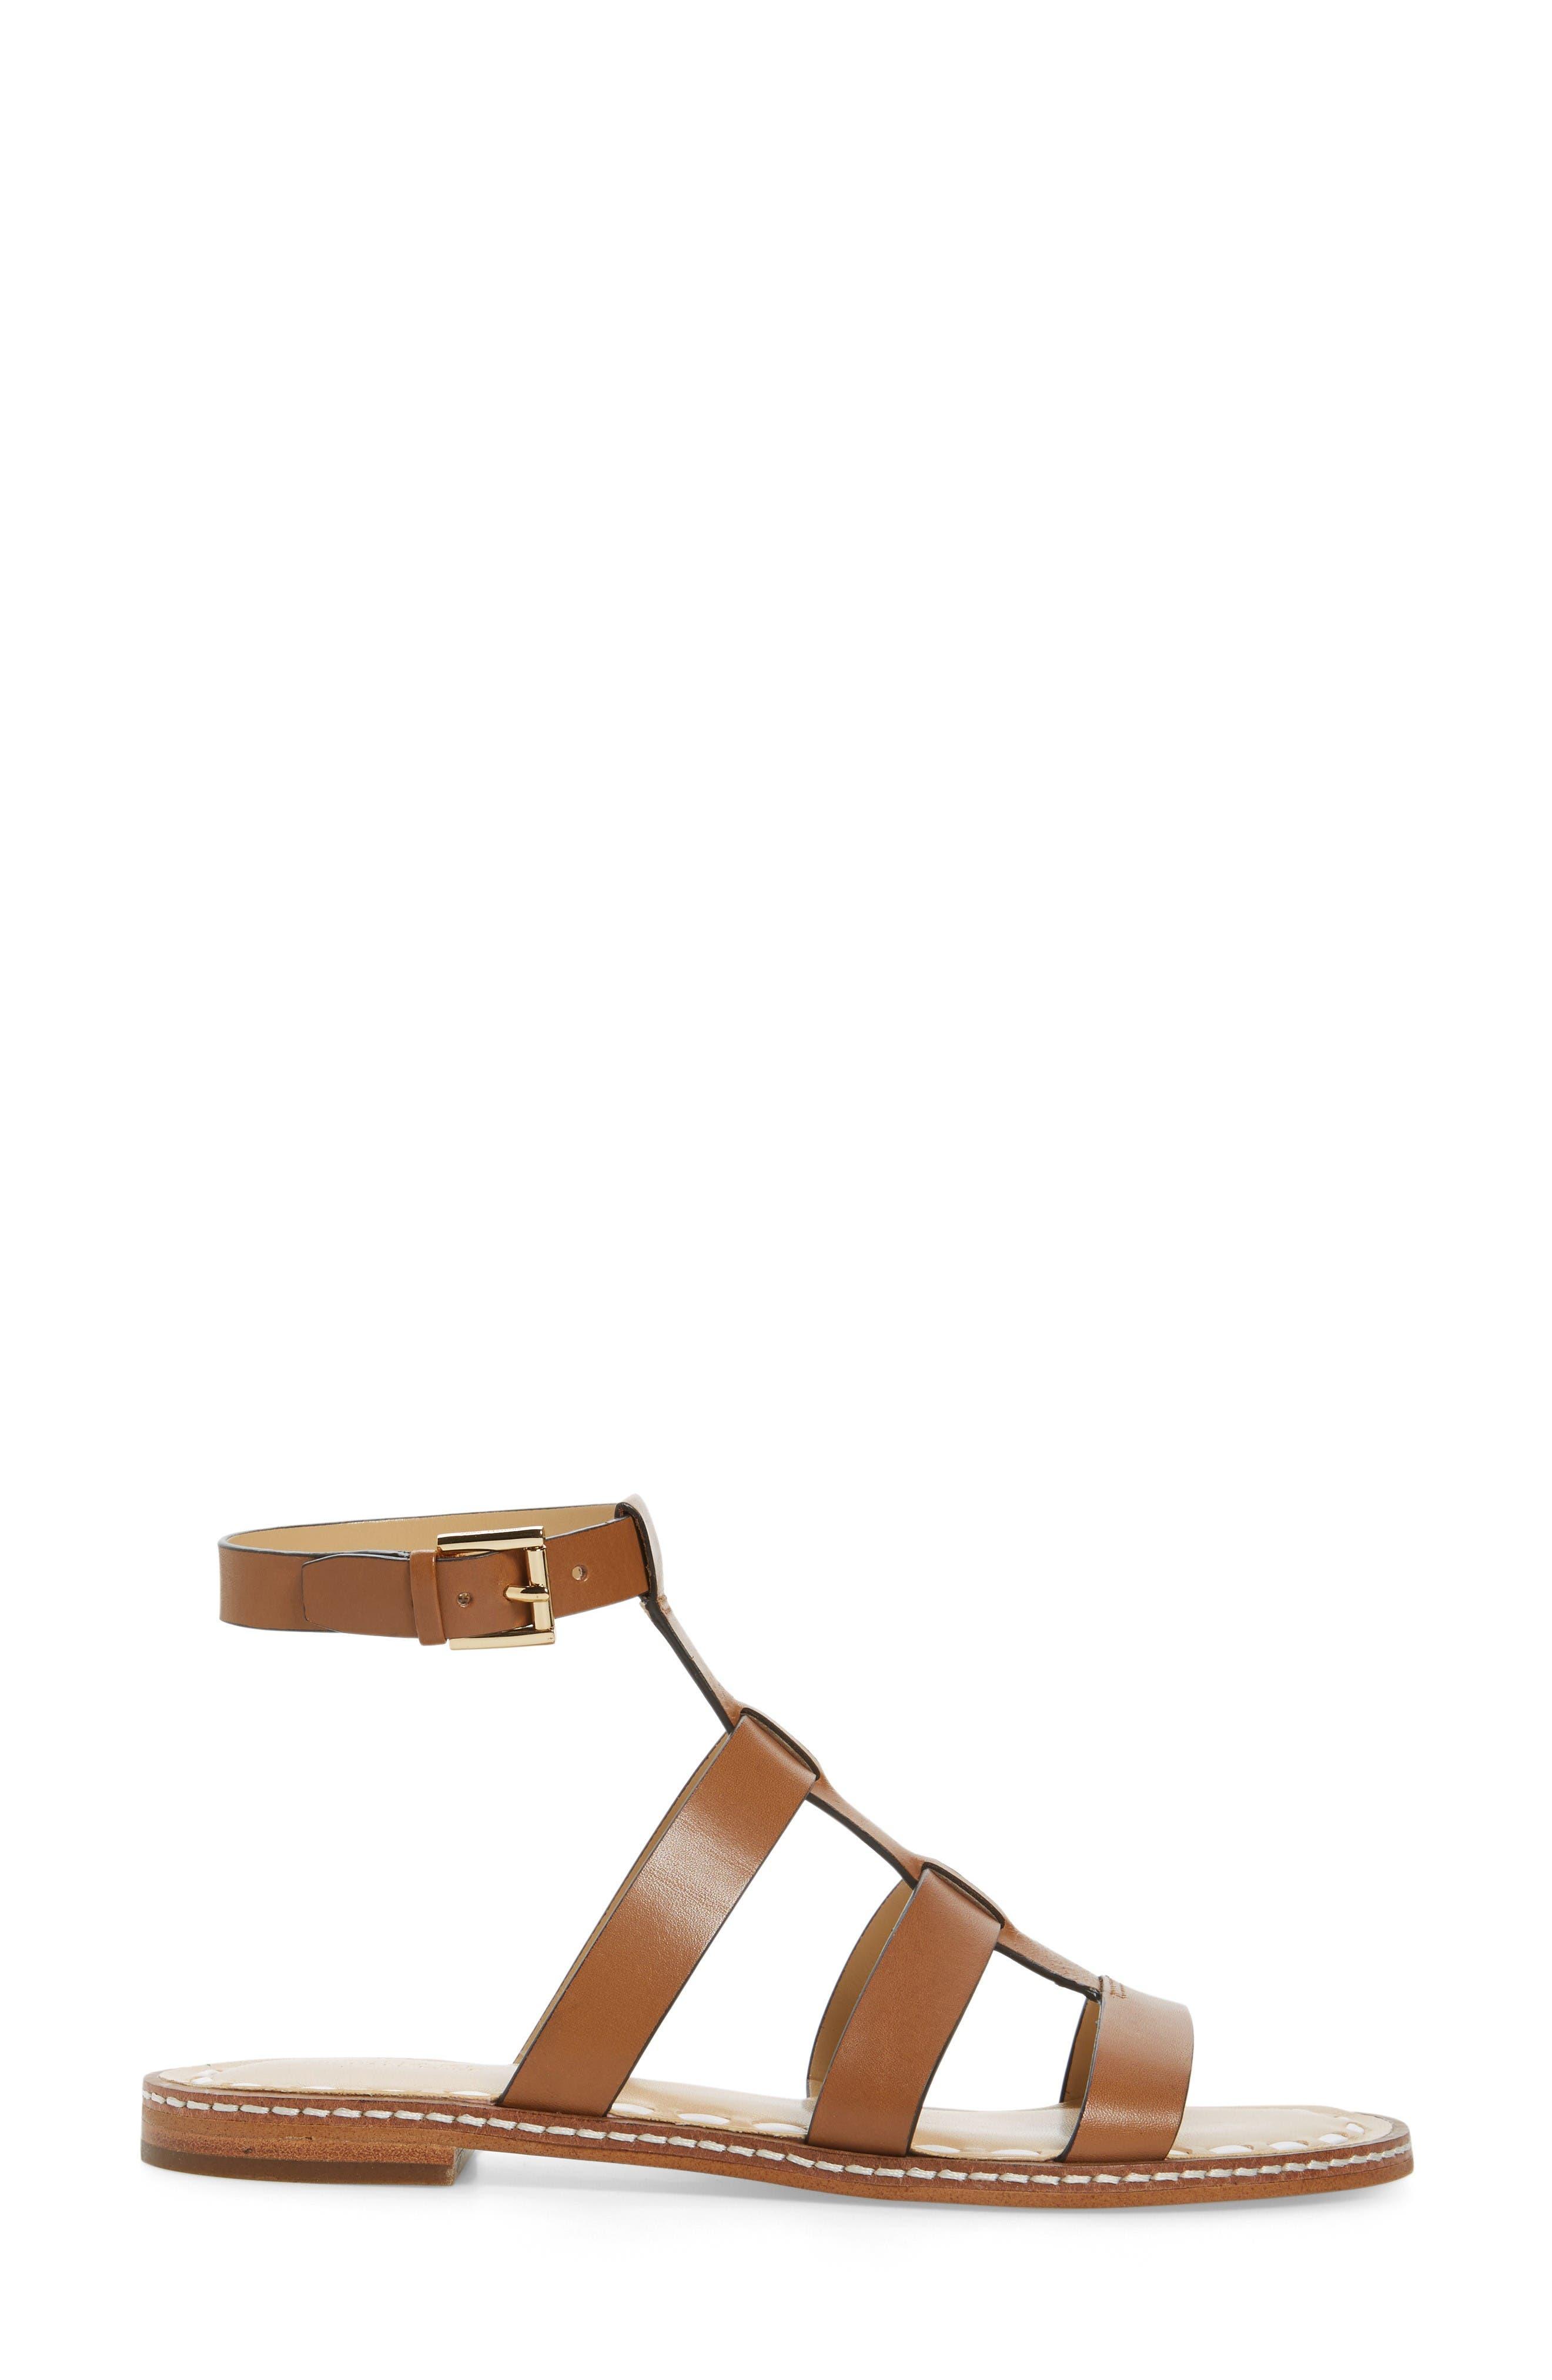 Fallon Gladiator Sandal,                             Alternate thumbnail 3, color,                             Acorn/ White Leather